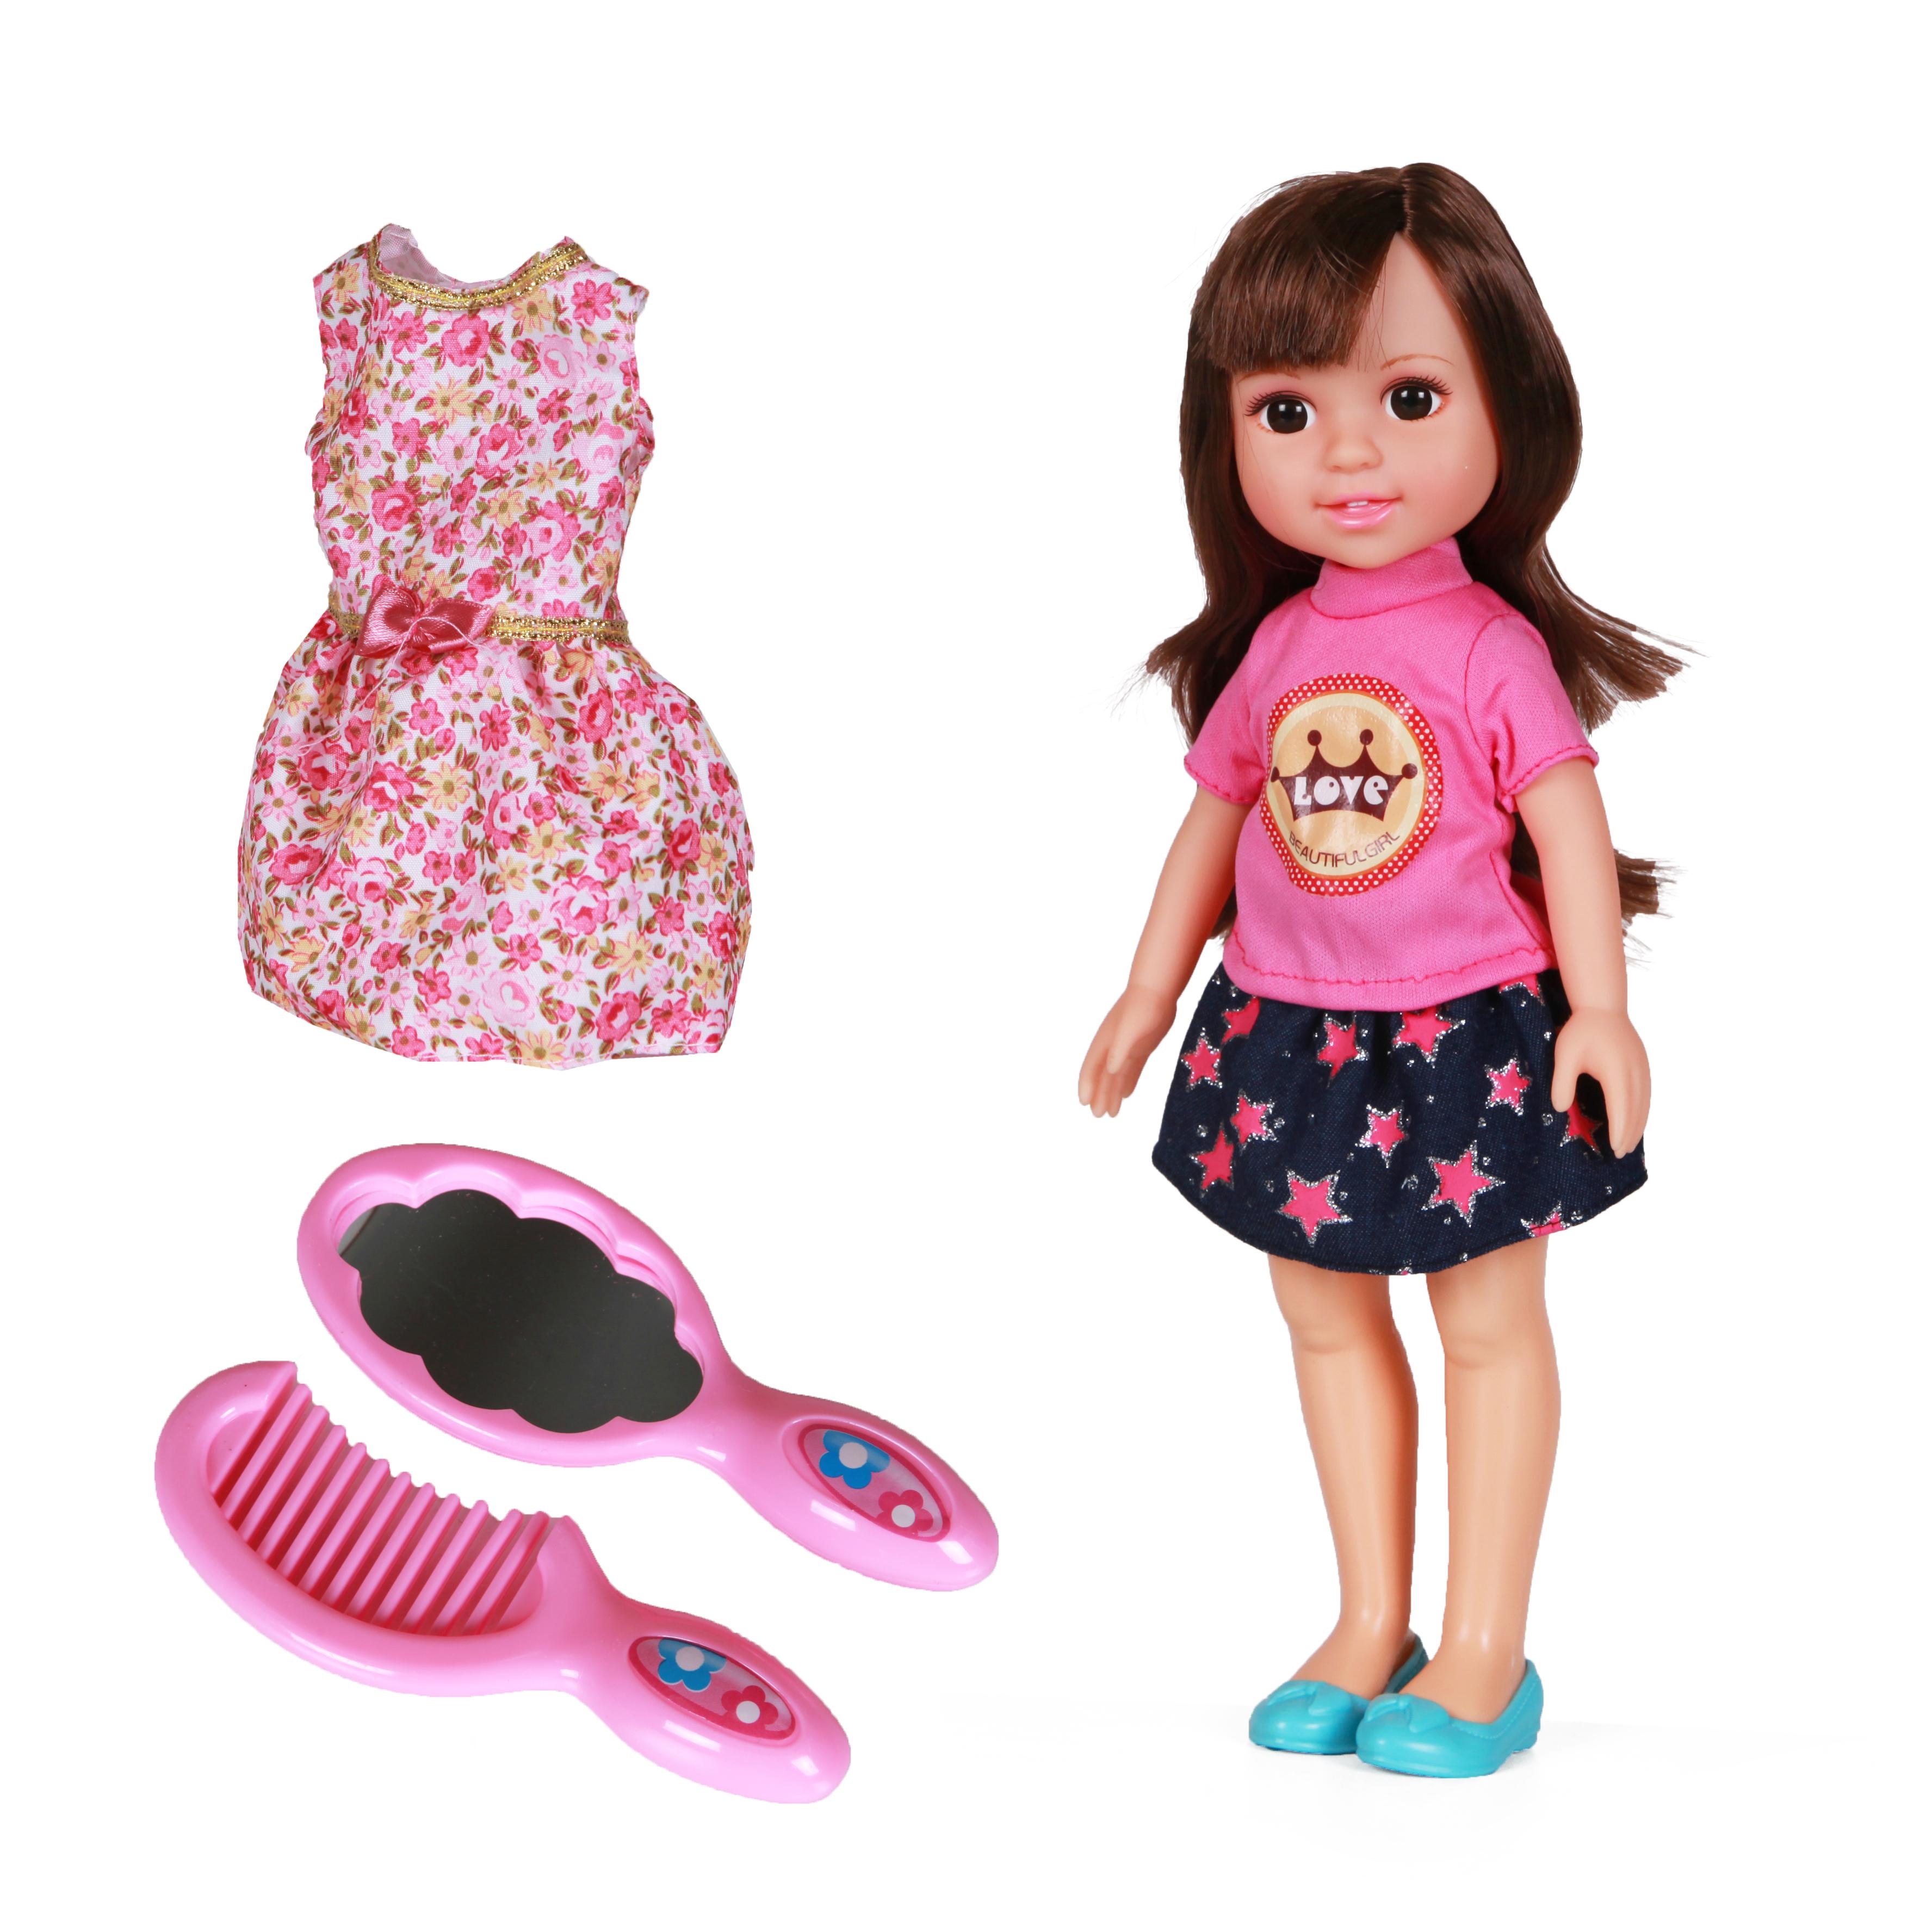 Кукла YAKO Jammy кукла yako jammy доктор m6309